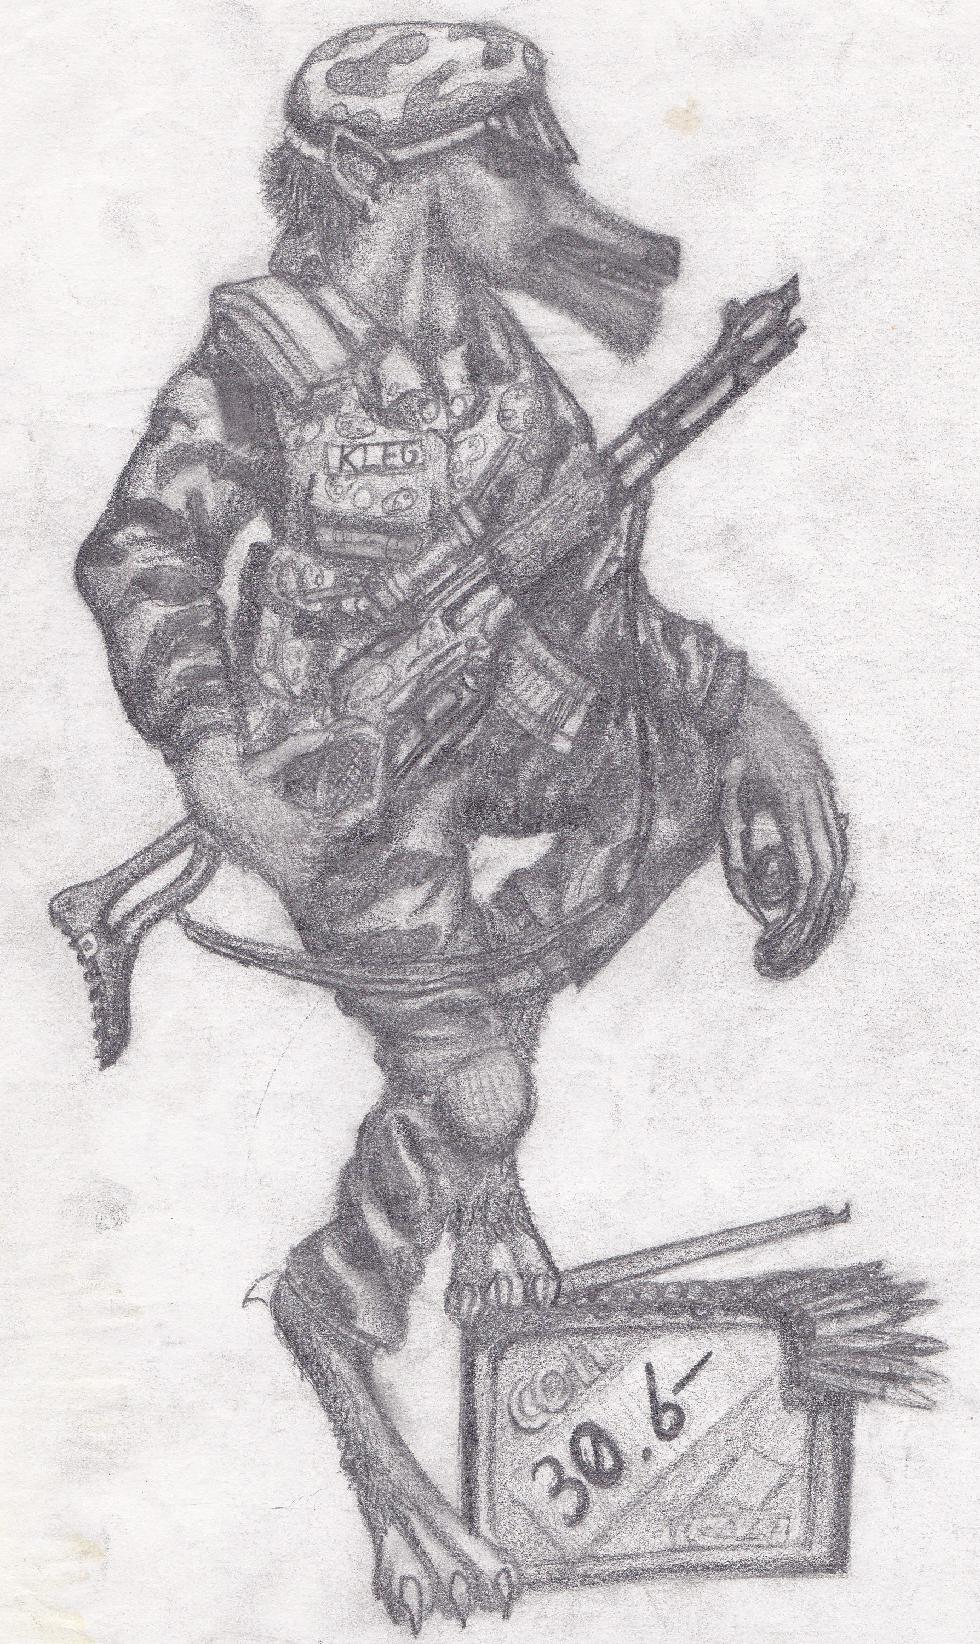 Kleg the Rifleman